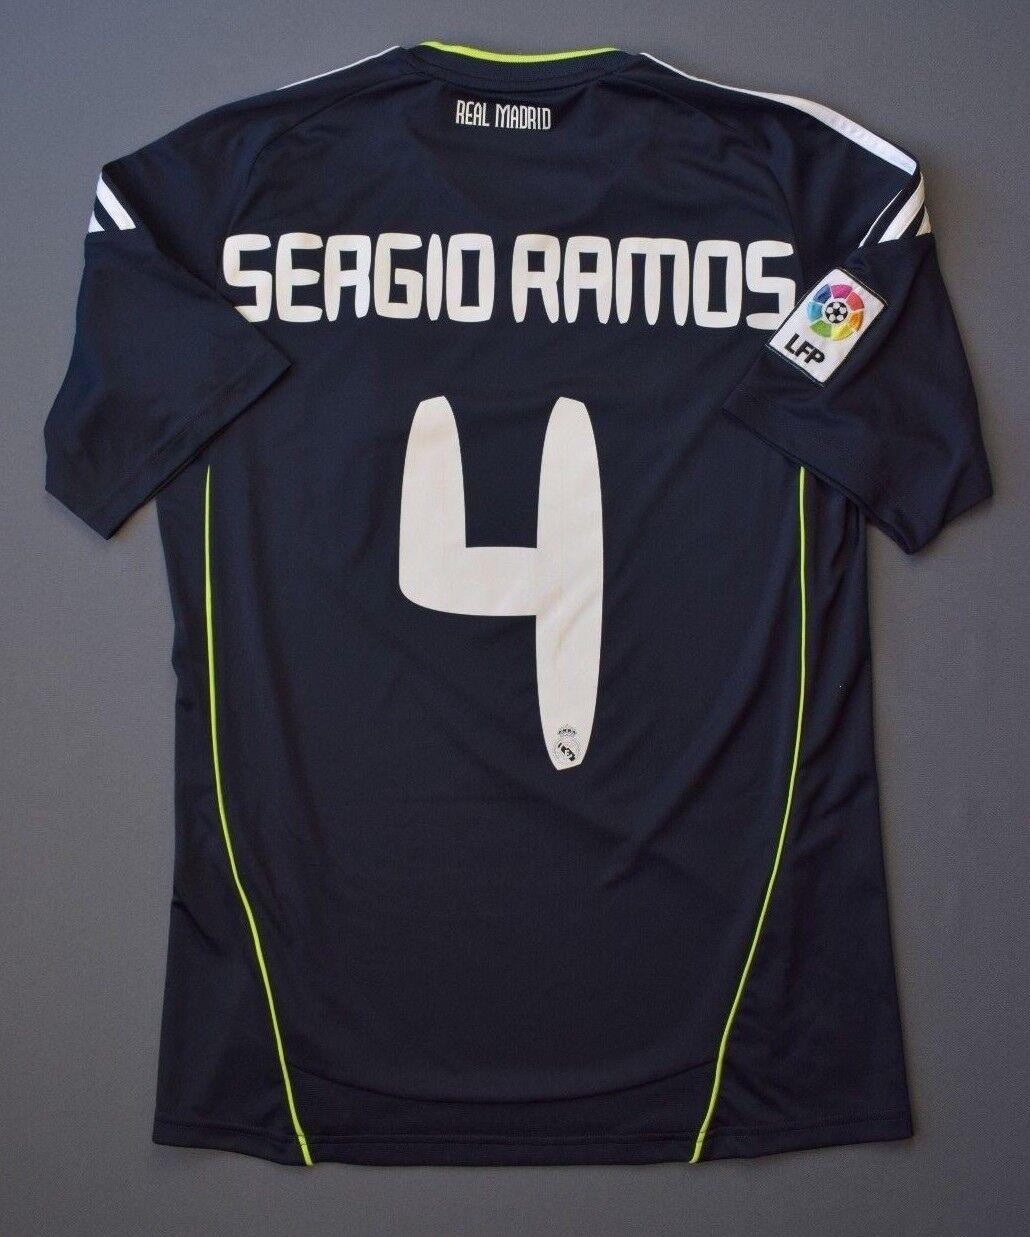 Jersey de Real Madrid Sergio Ramos 2010 11 Away Camiseta De Fútbol Talla S Adidas 5 5